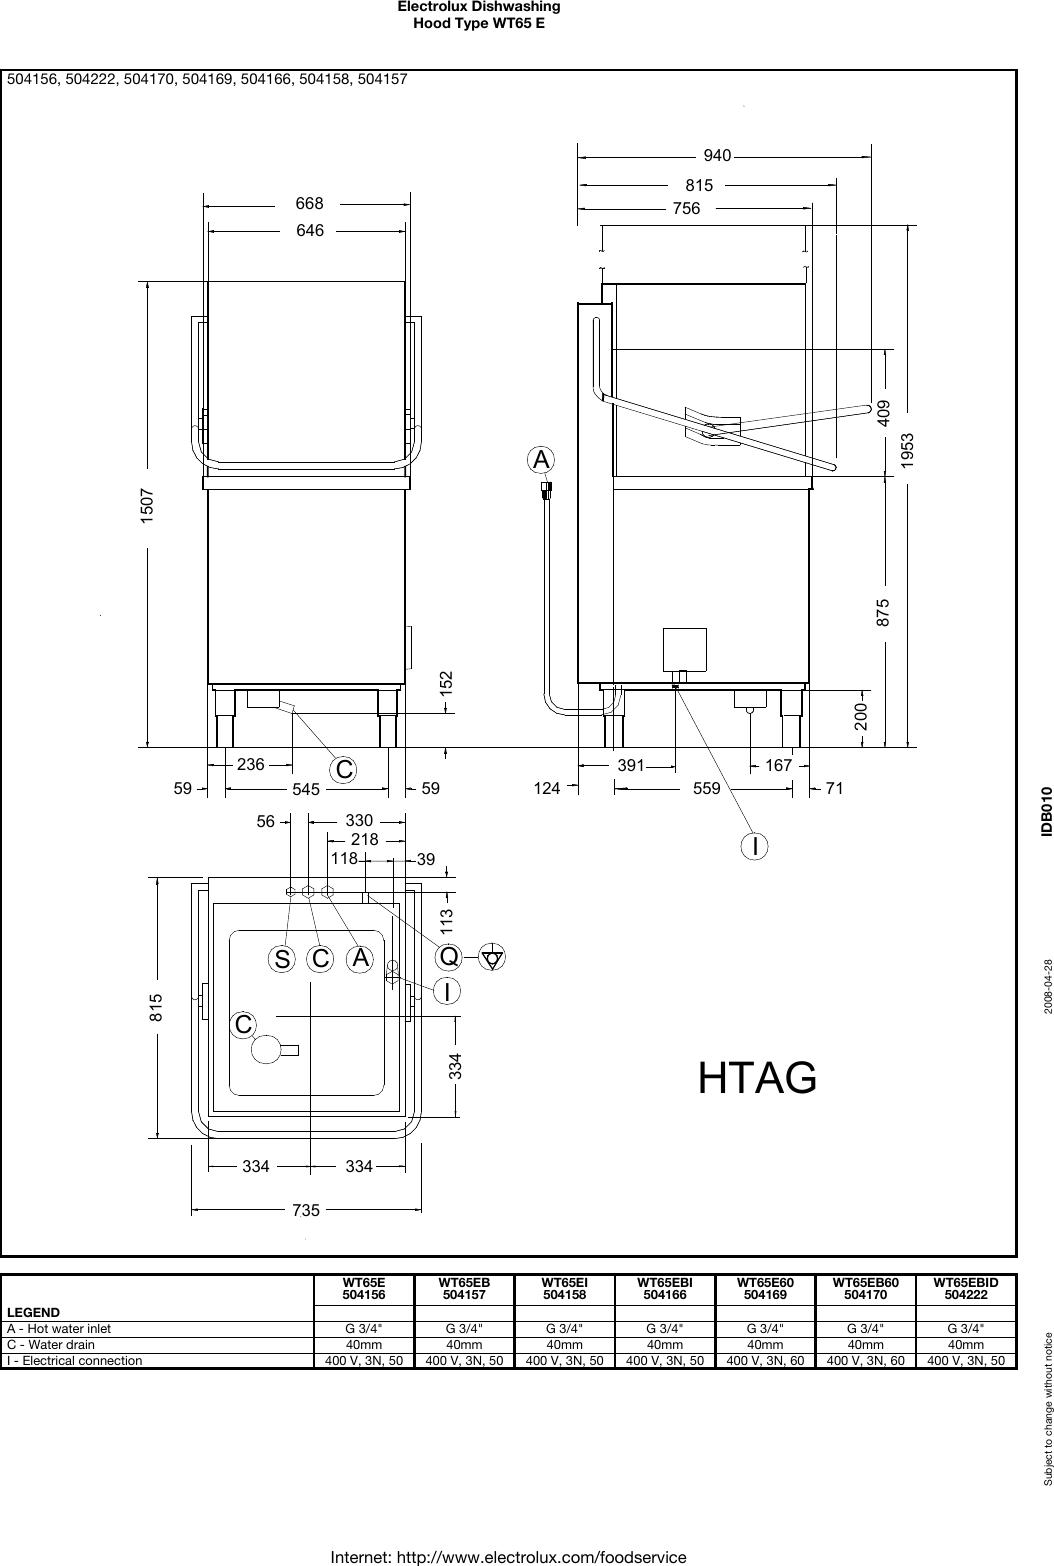 Electrolux WT65E Dishwashing User Manual To The 6fe5972e